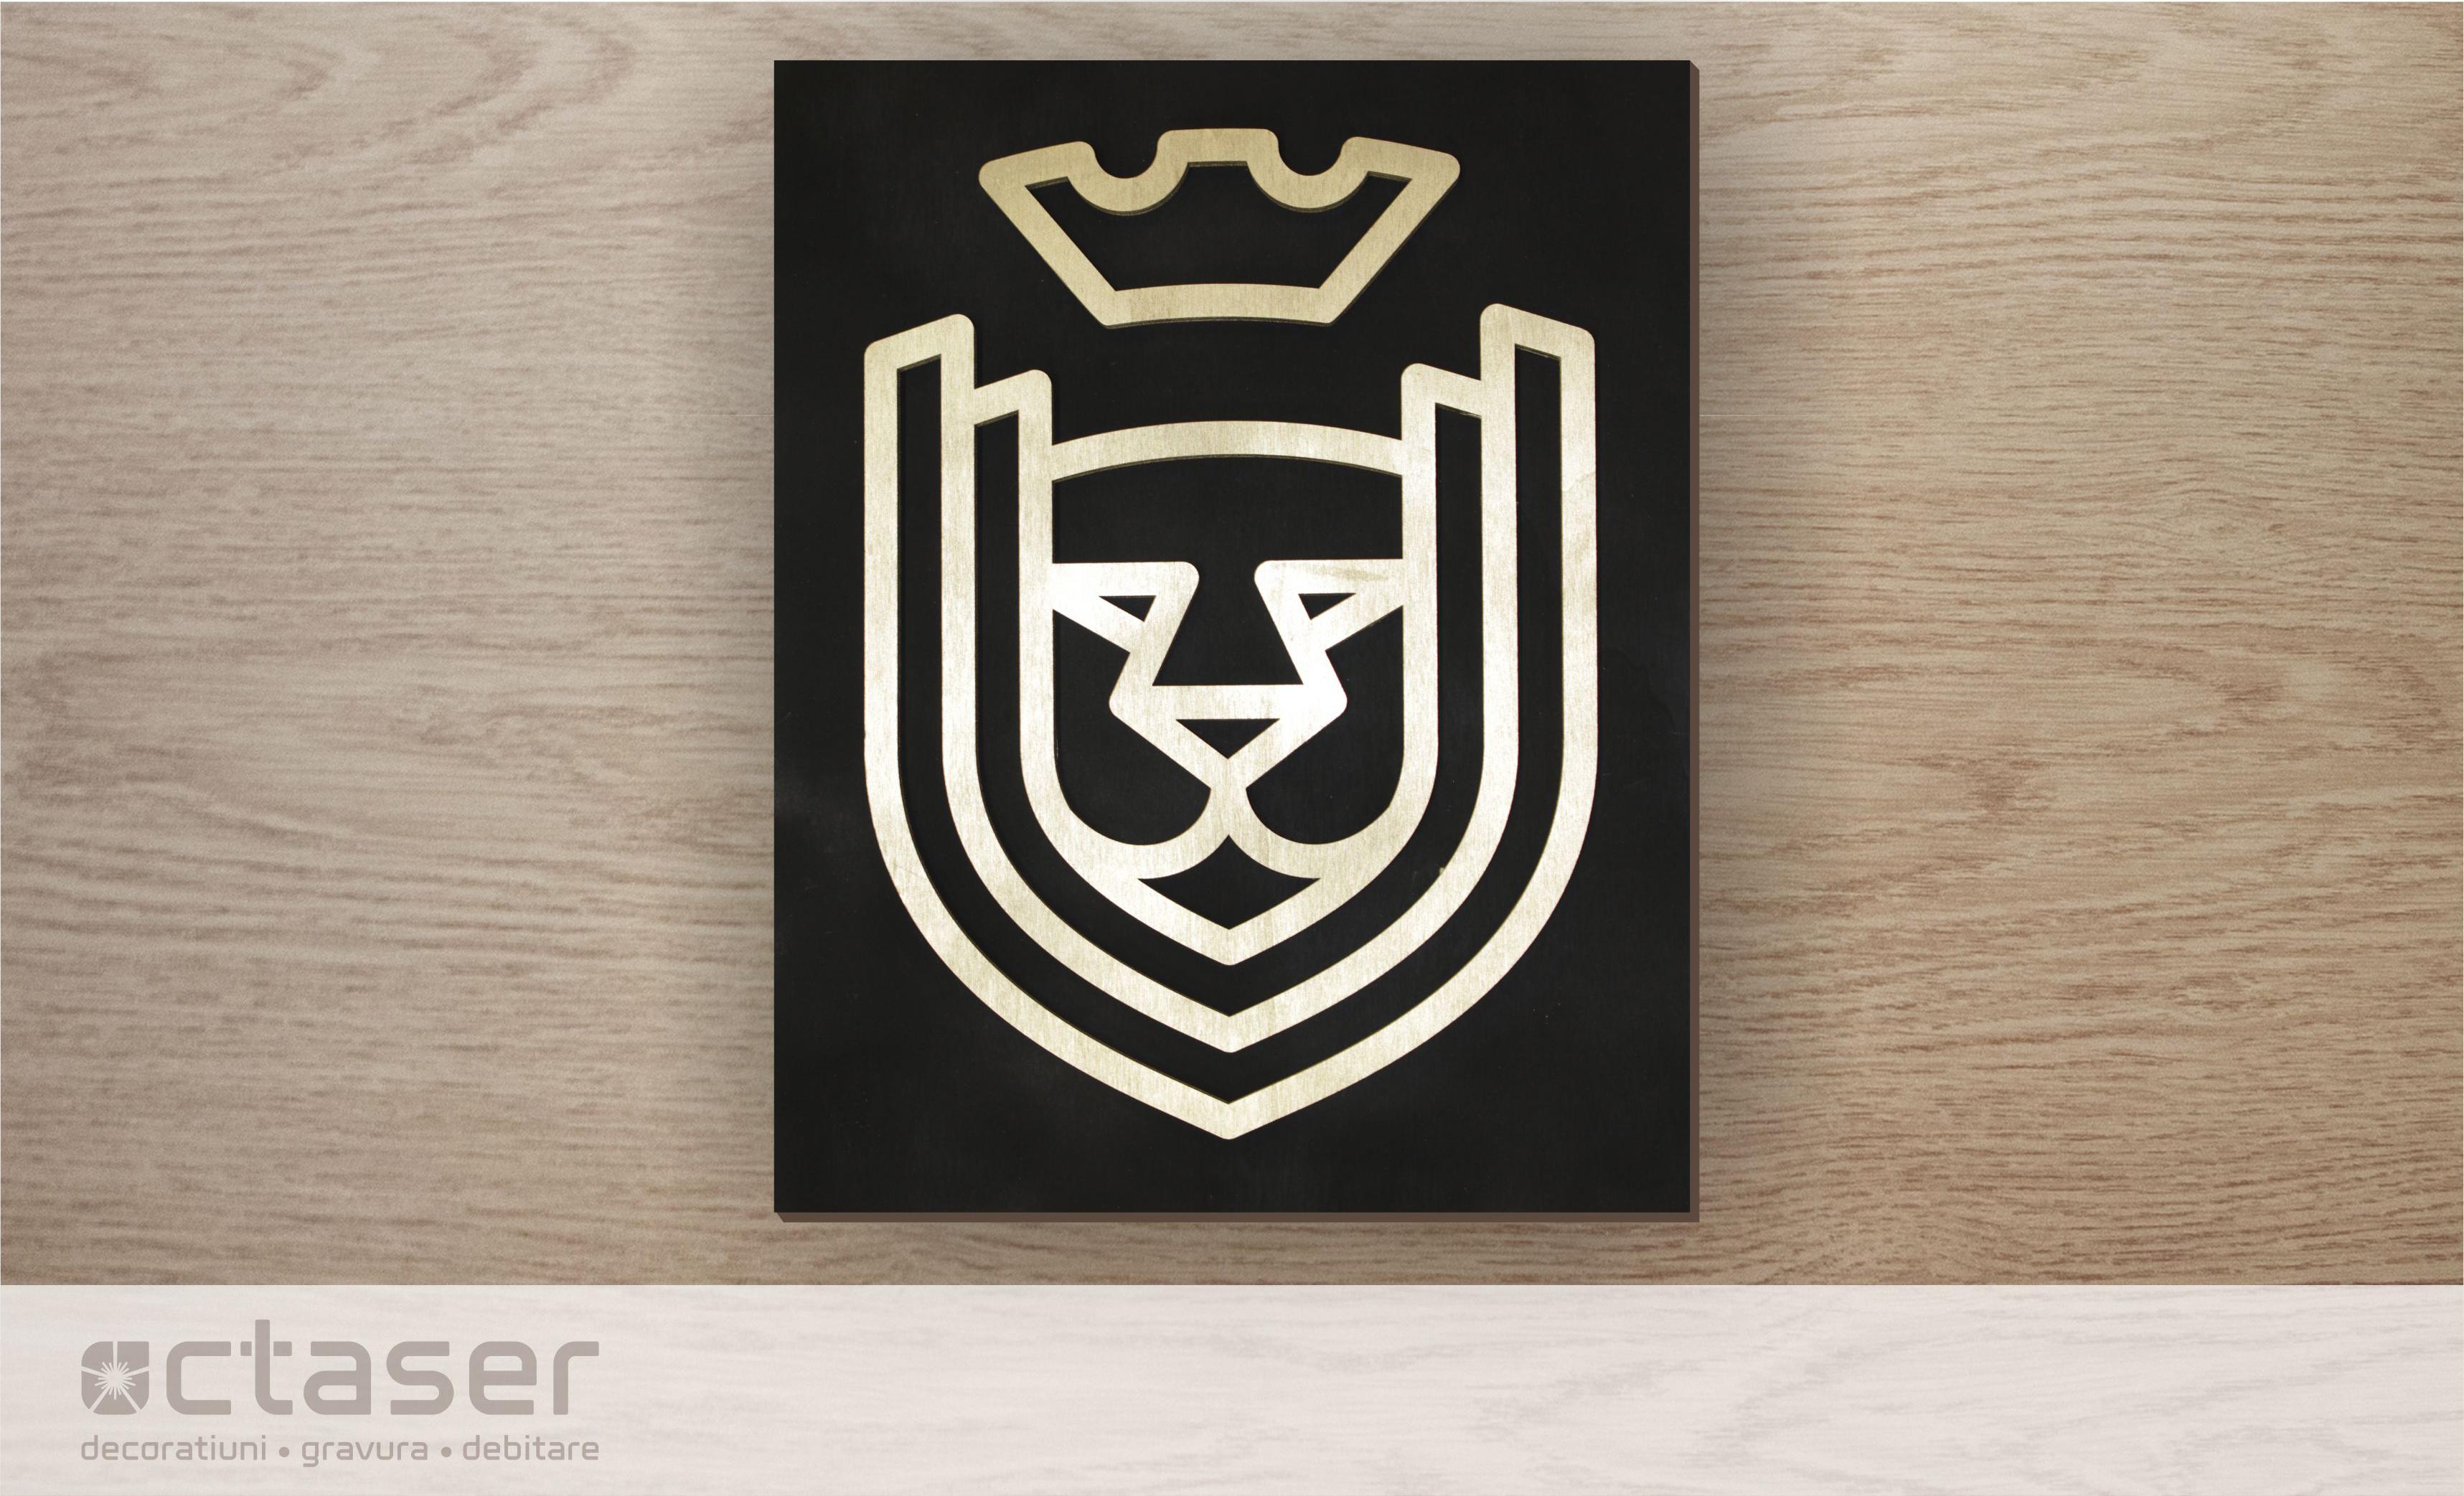 Logo debitat din placaj plop si vopsit auriu pe placa suport lemn